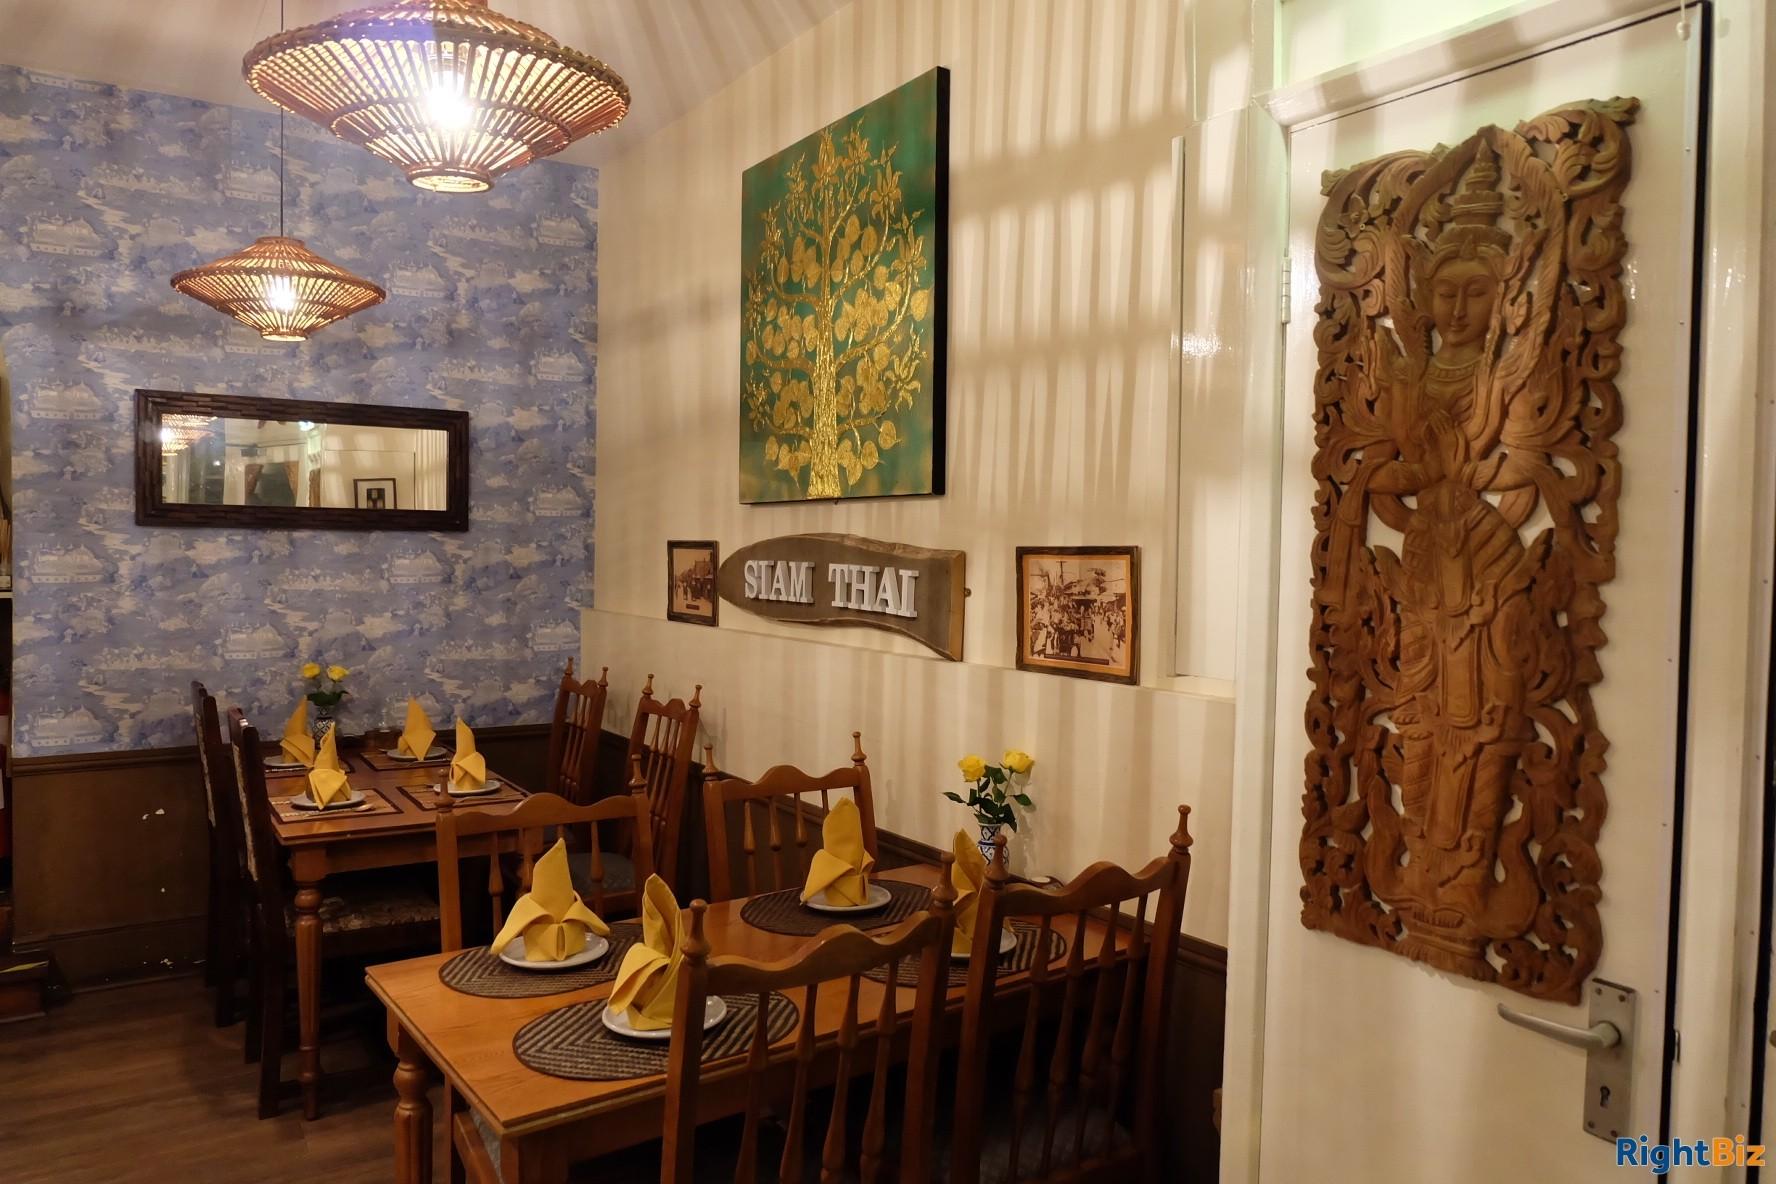 Thai restaurant and take away, Braintree - Image 5